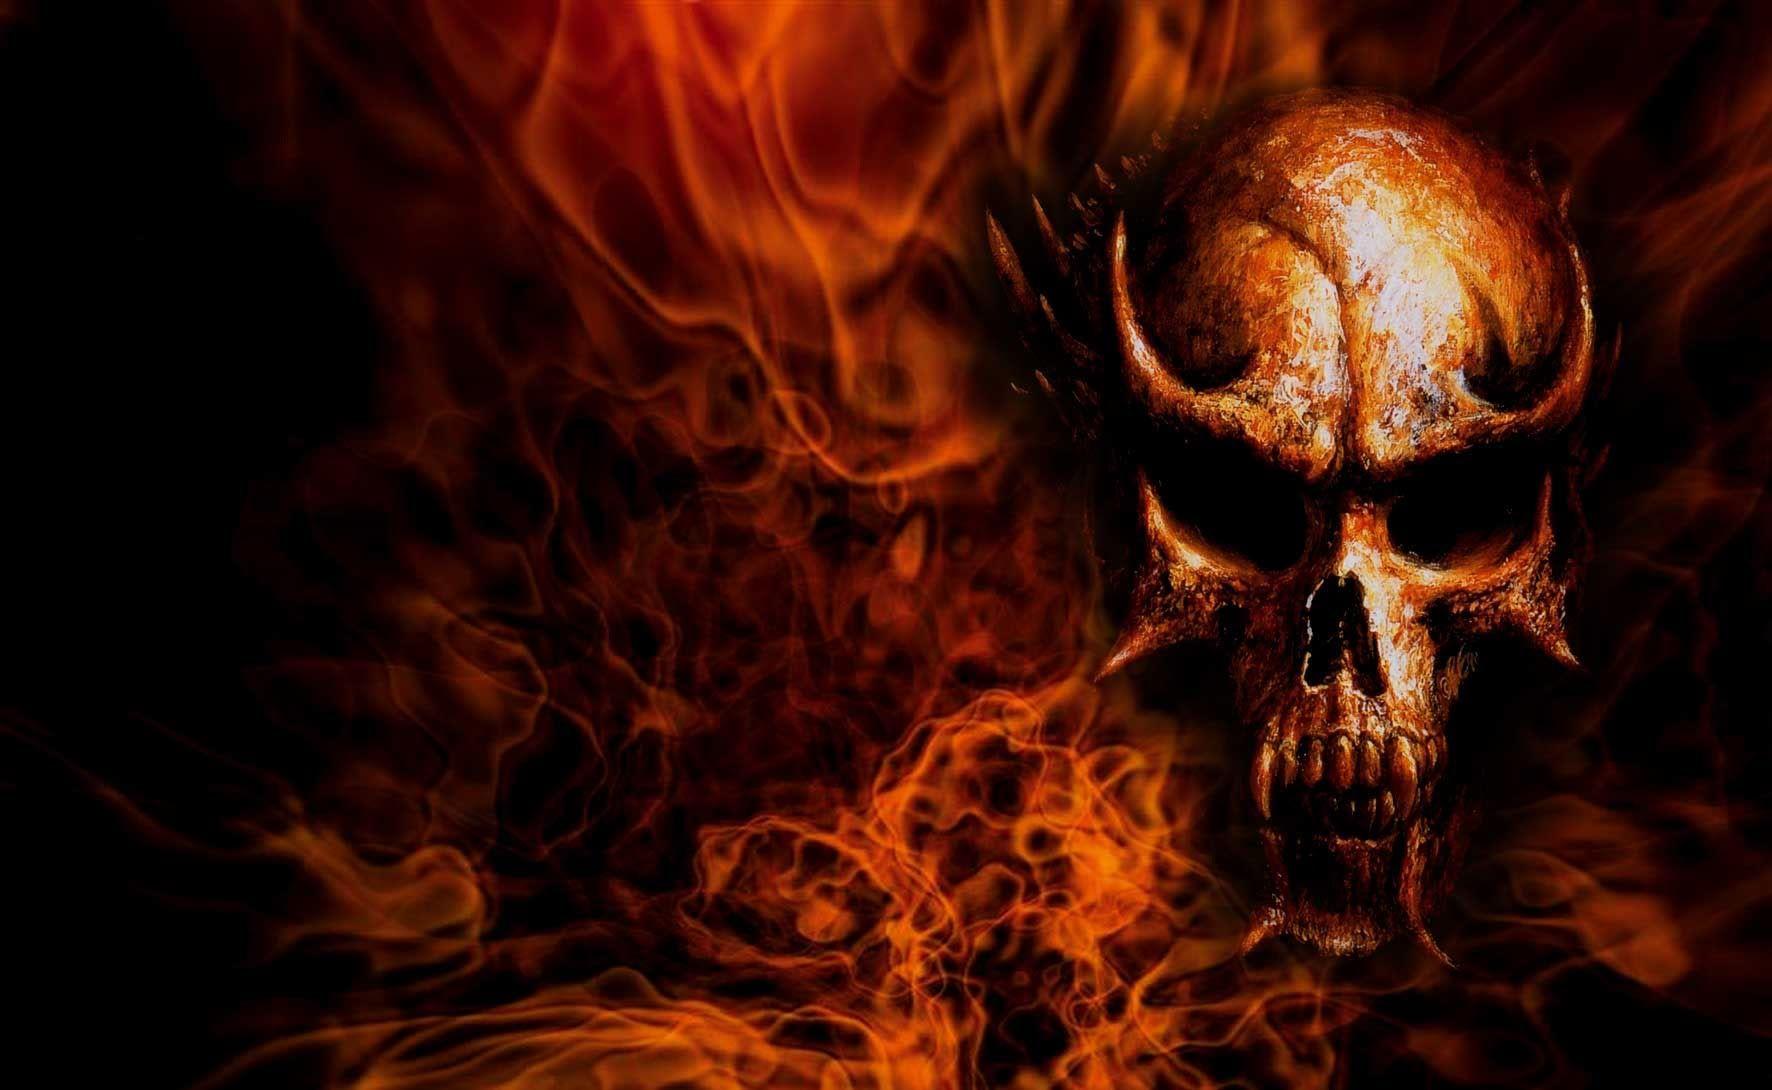 Flaming Skull Backgrounds